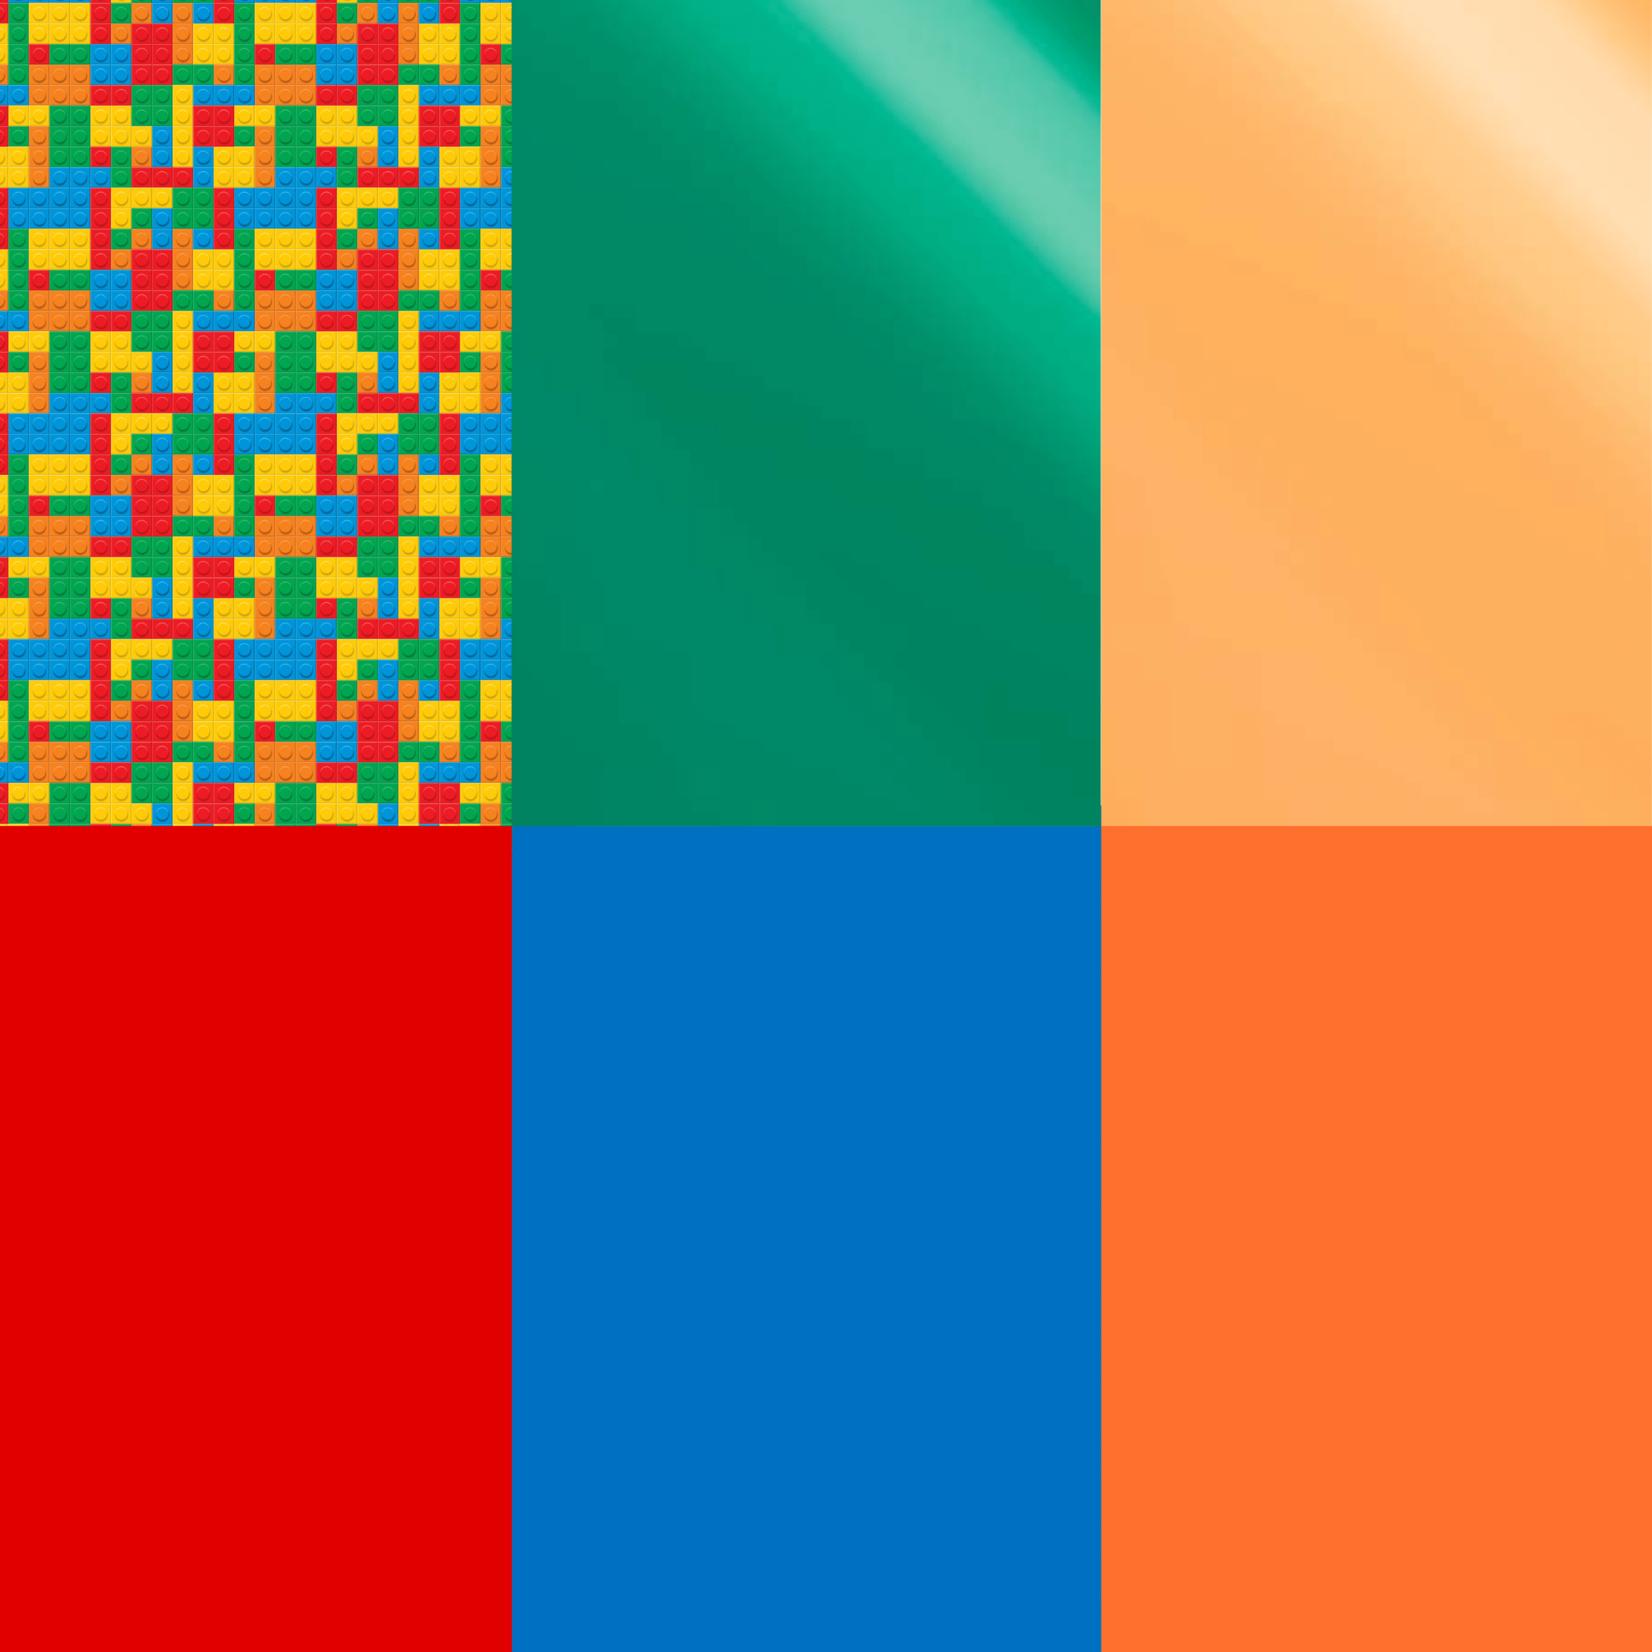 HTV Pack Colorful Bricks